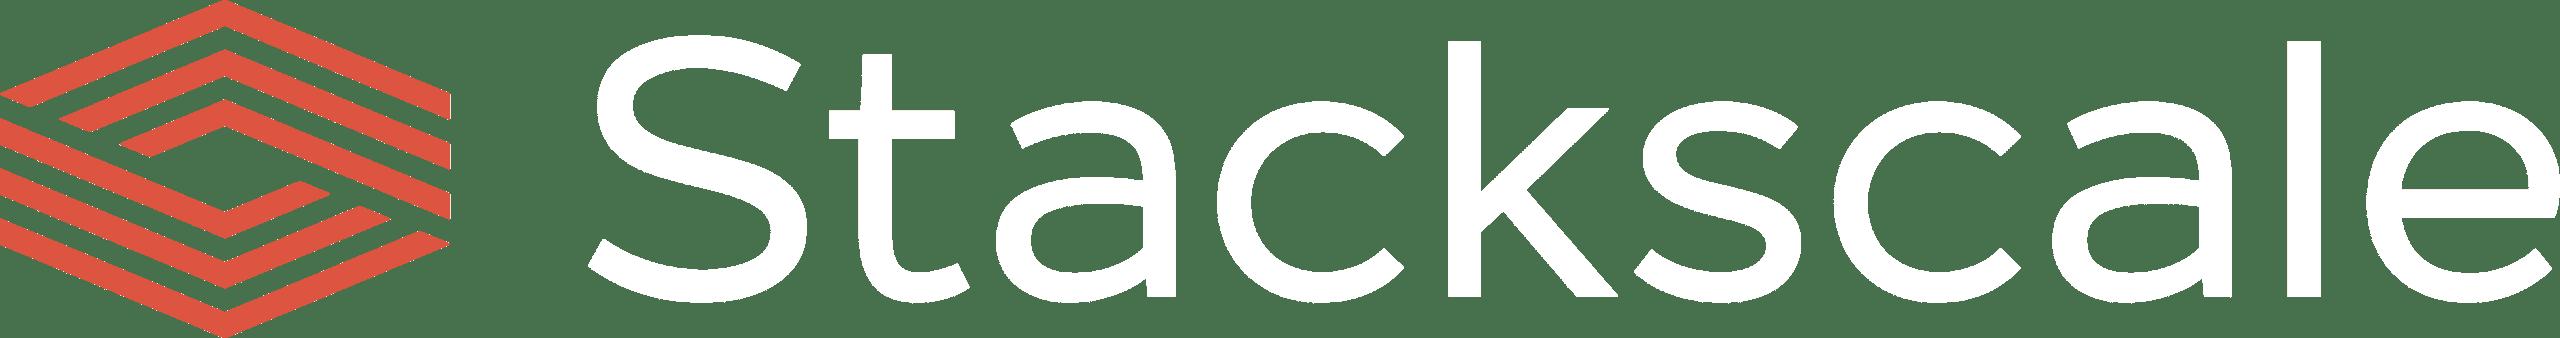 Stackscale logo